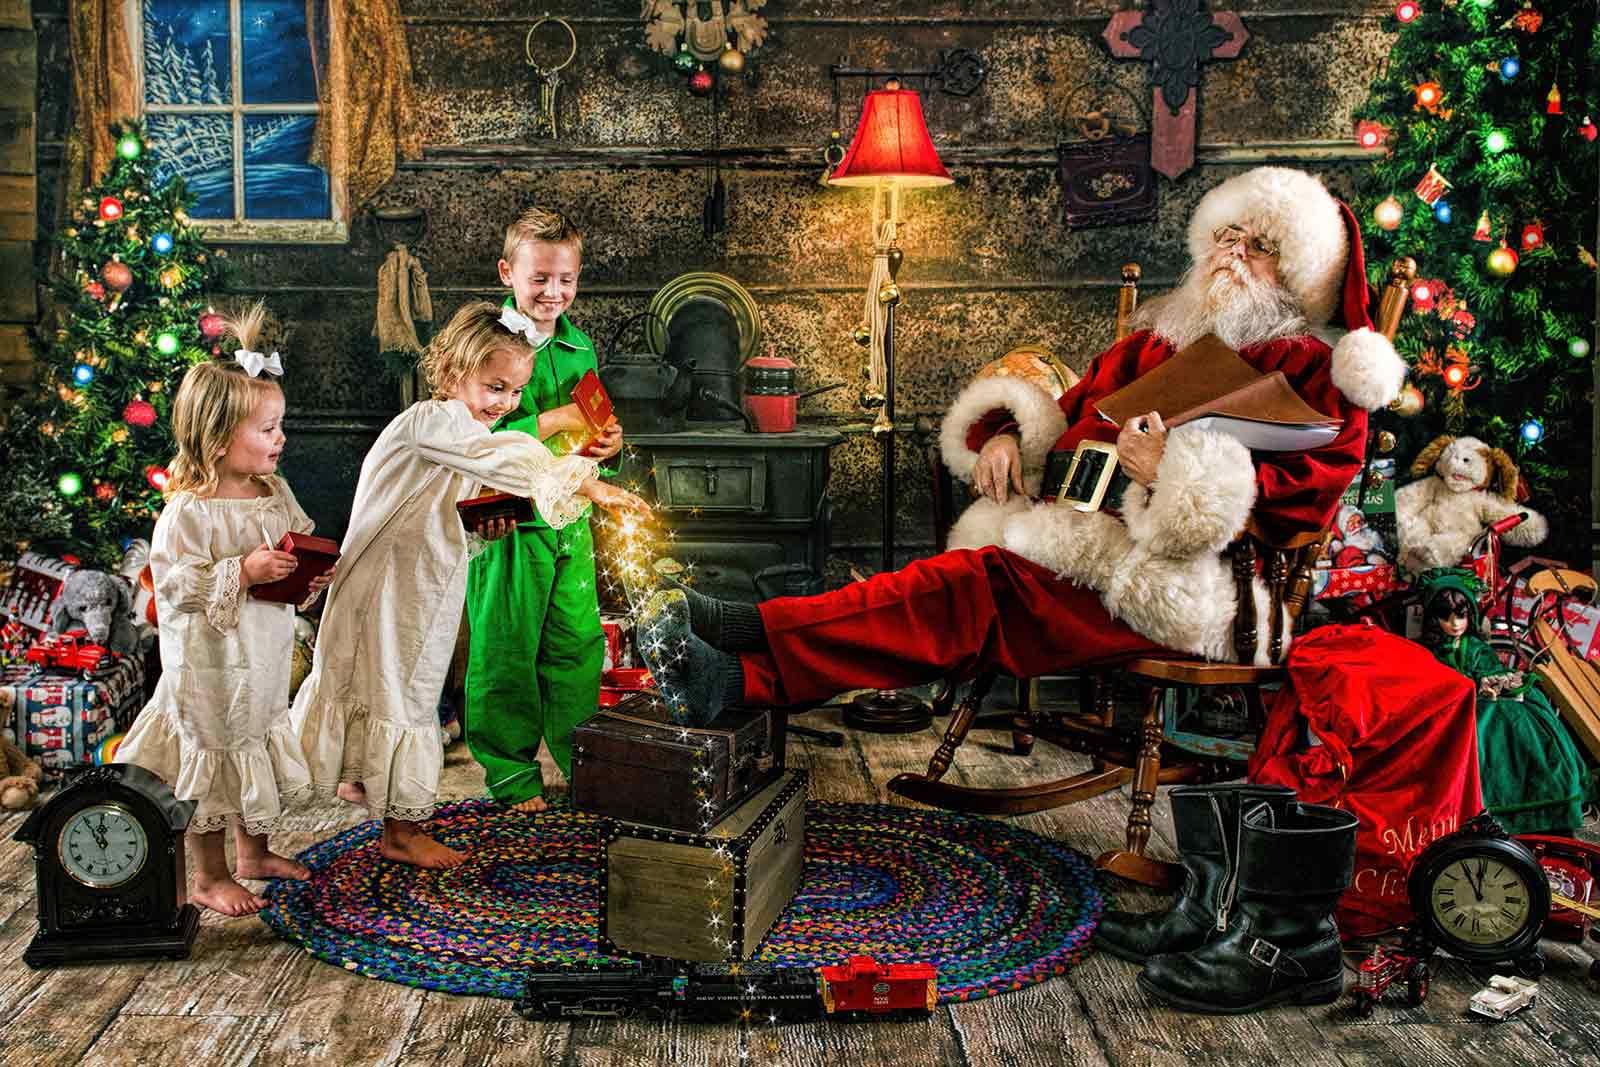 003_Magic-of-Santa-Anna-Thielen-Photography